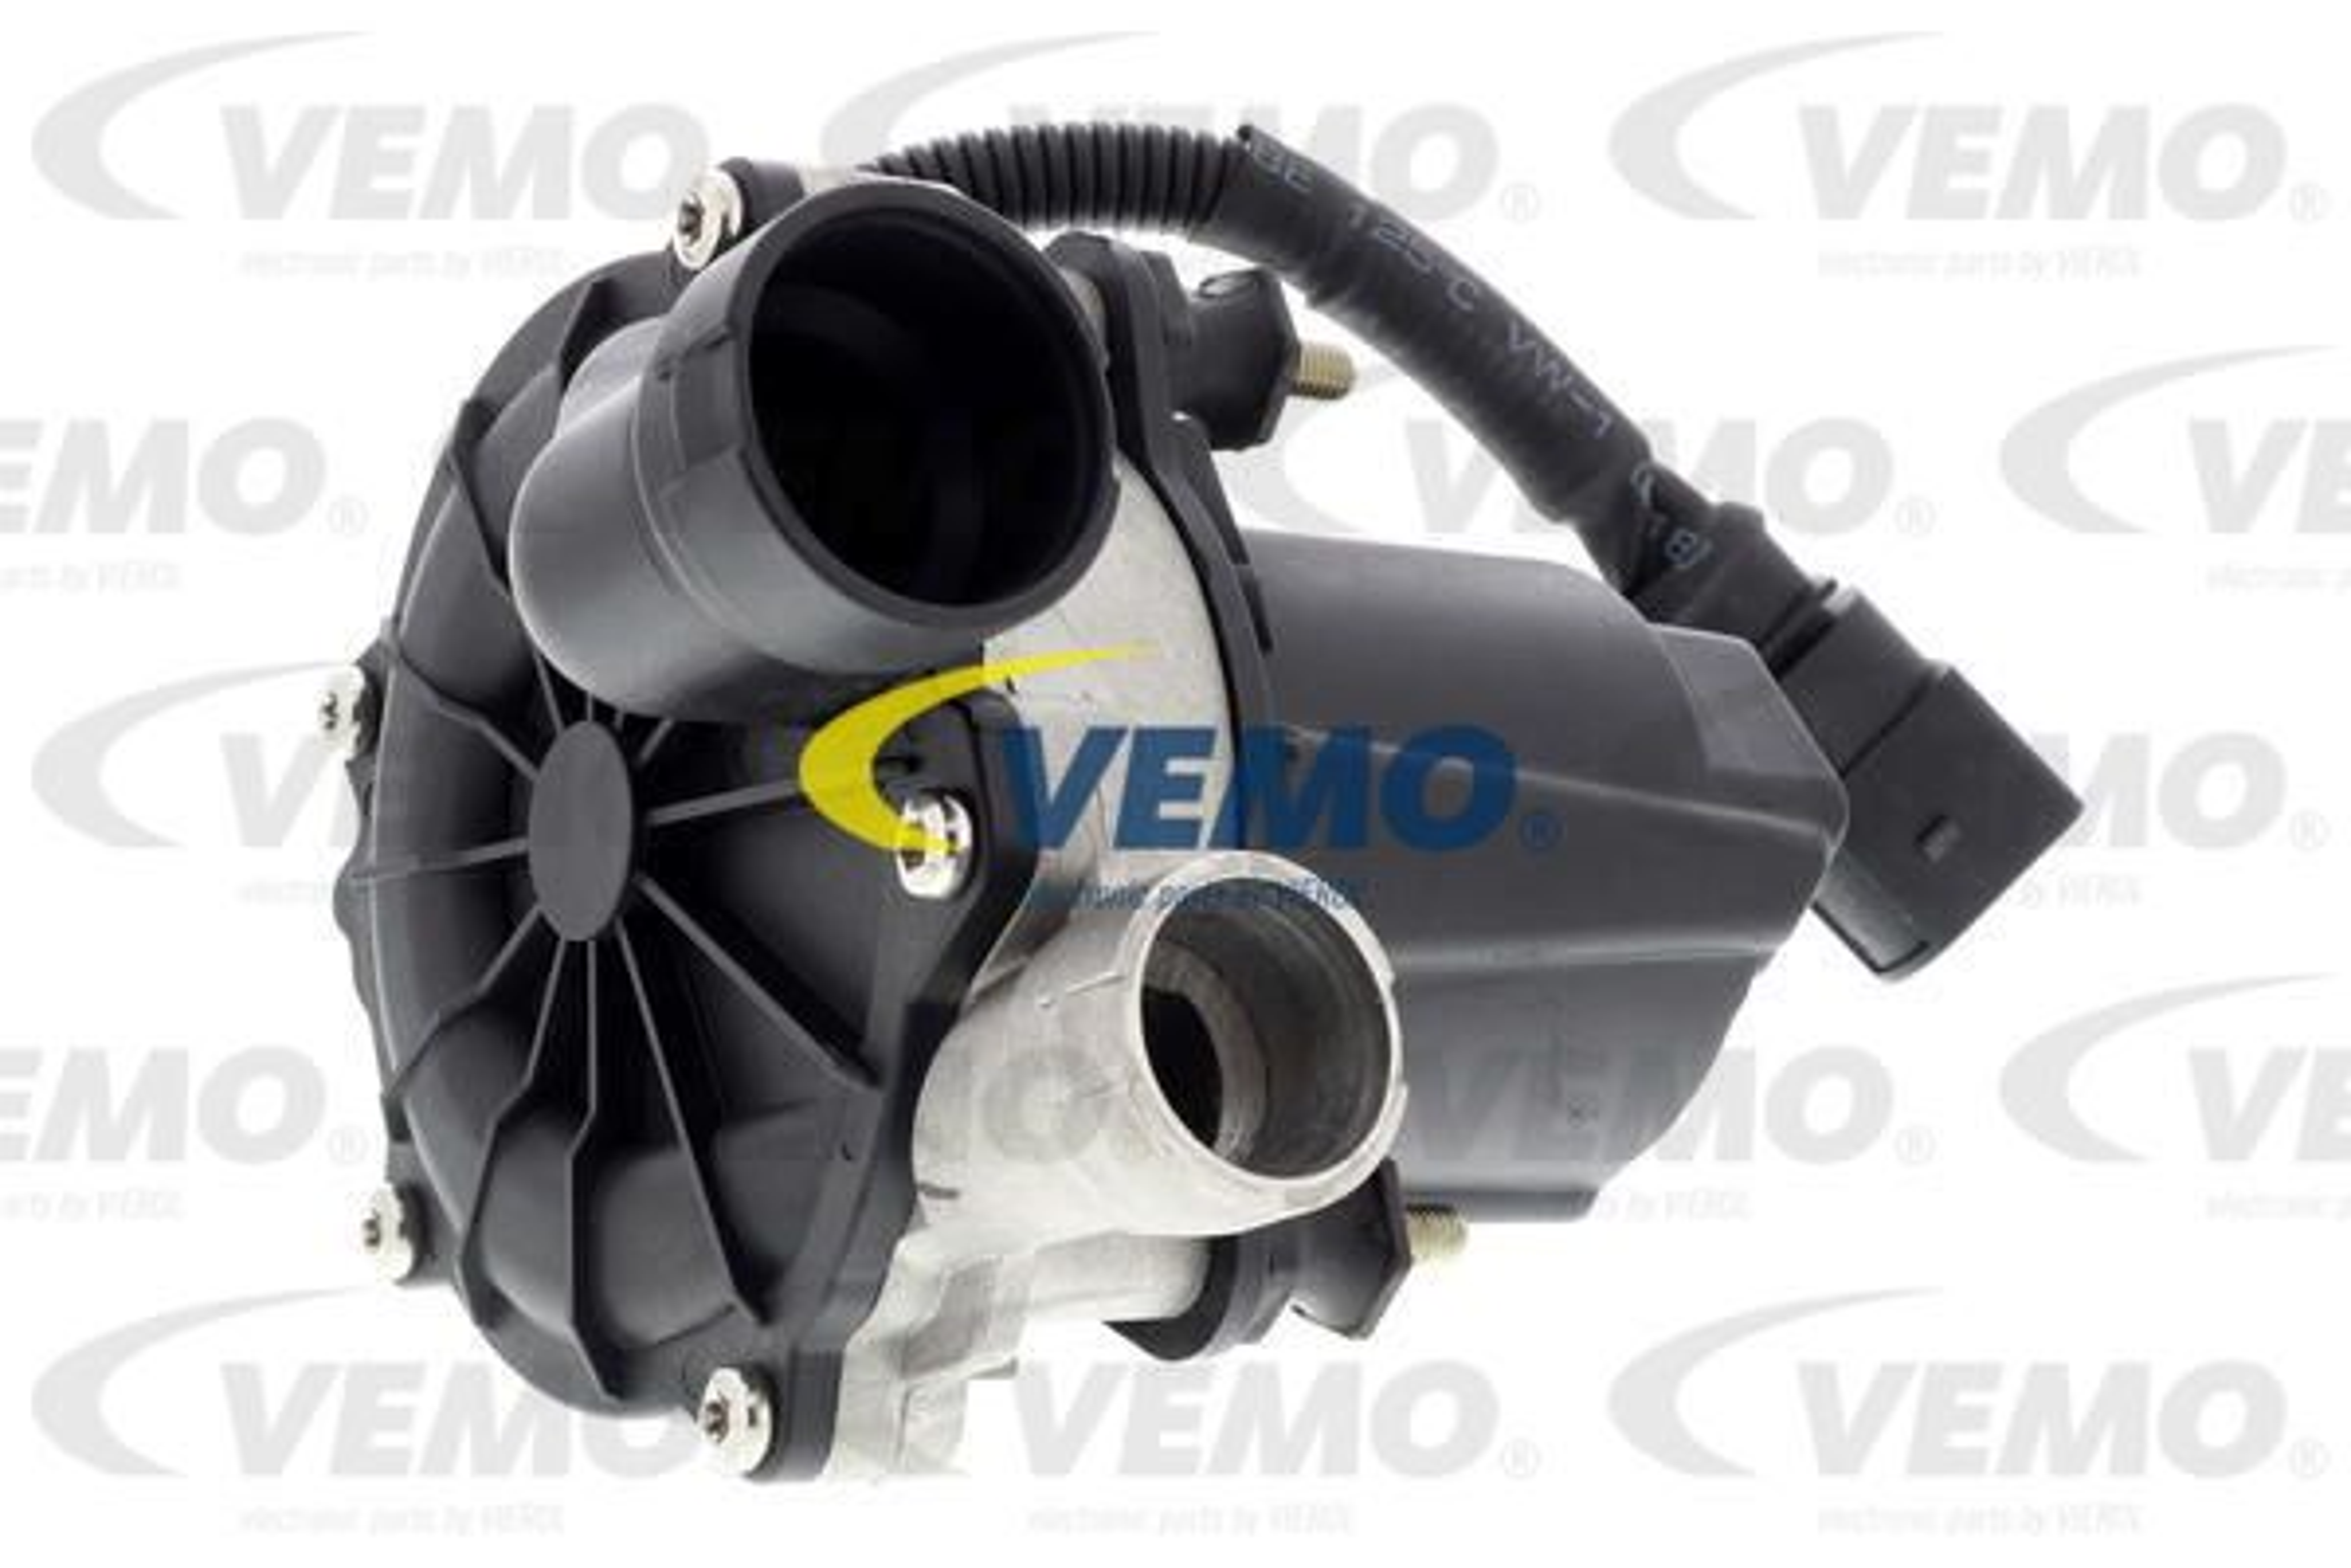 Volkswagen TIGUAN 2020 Secondary air pump module VEMO V10-63-0154: